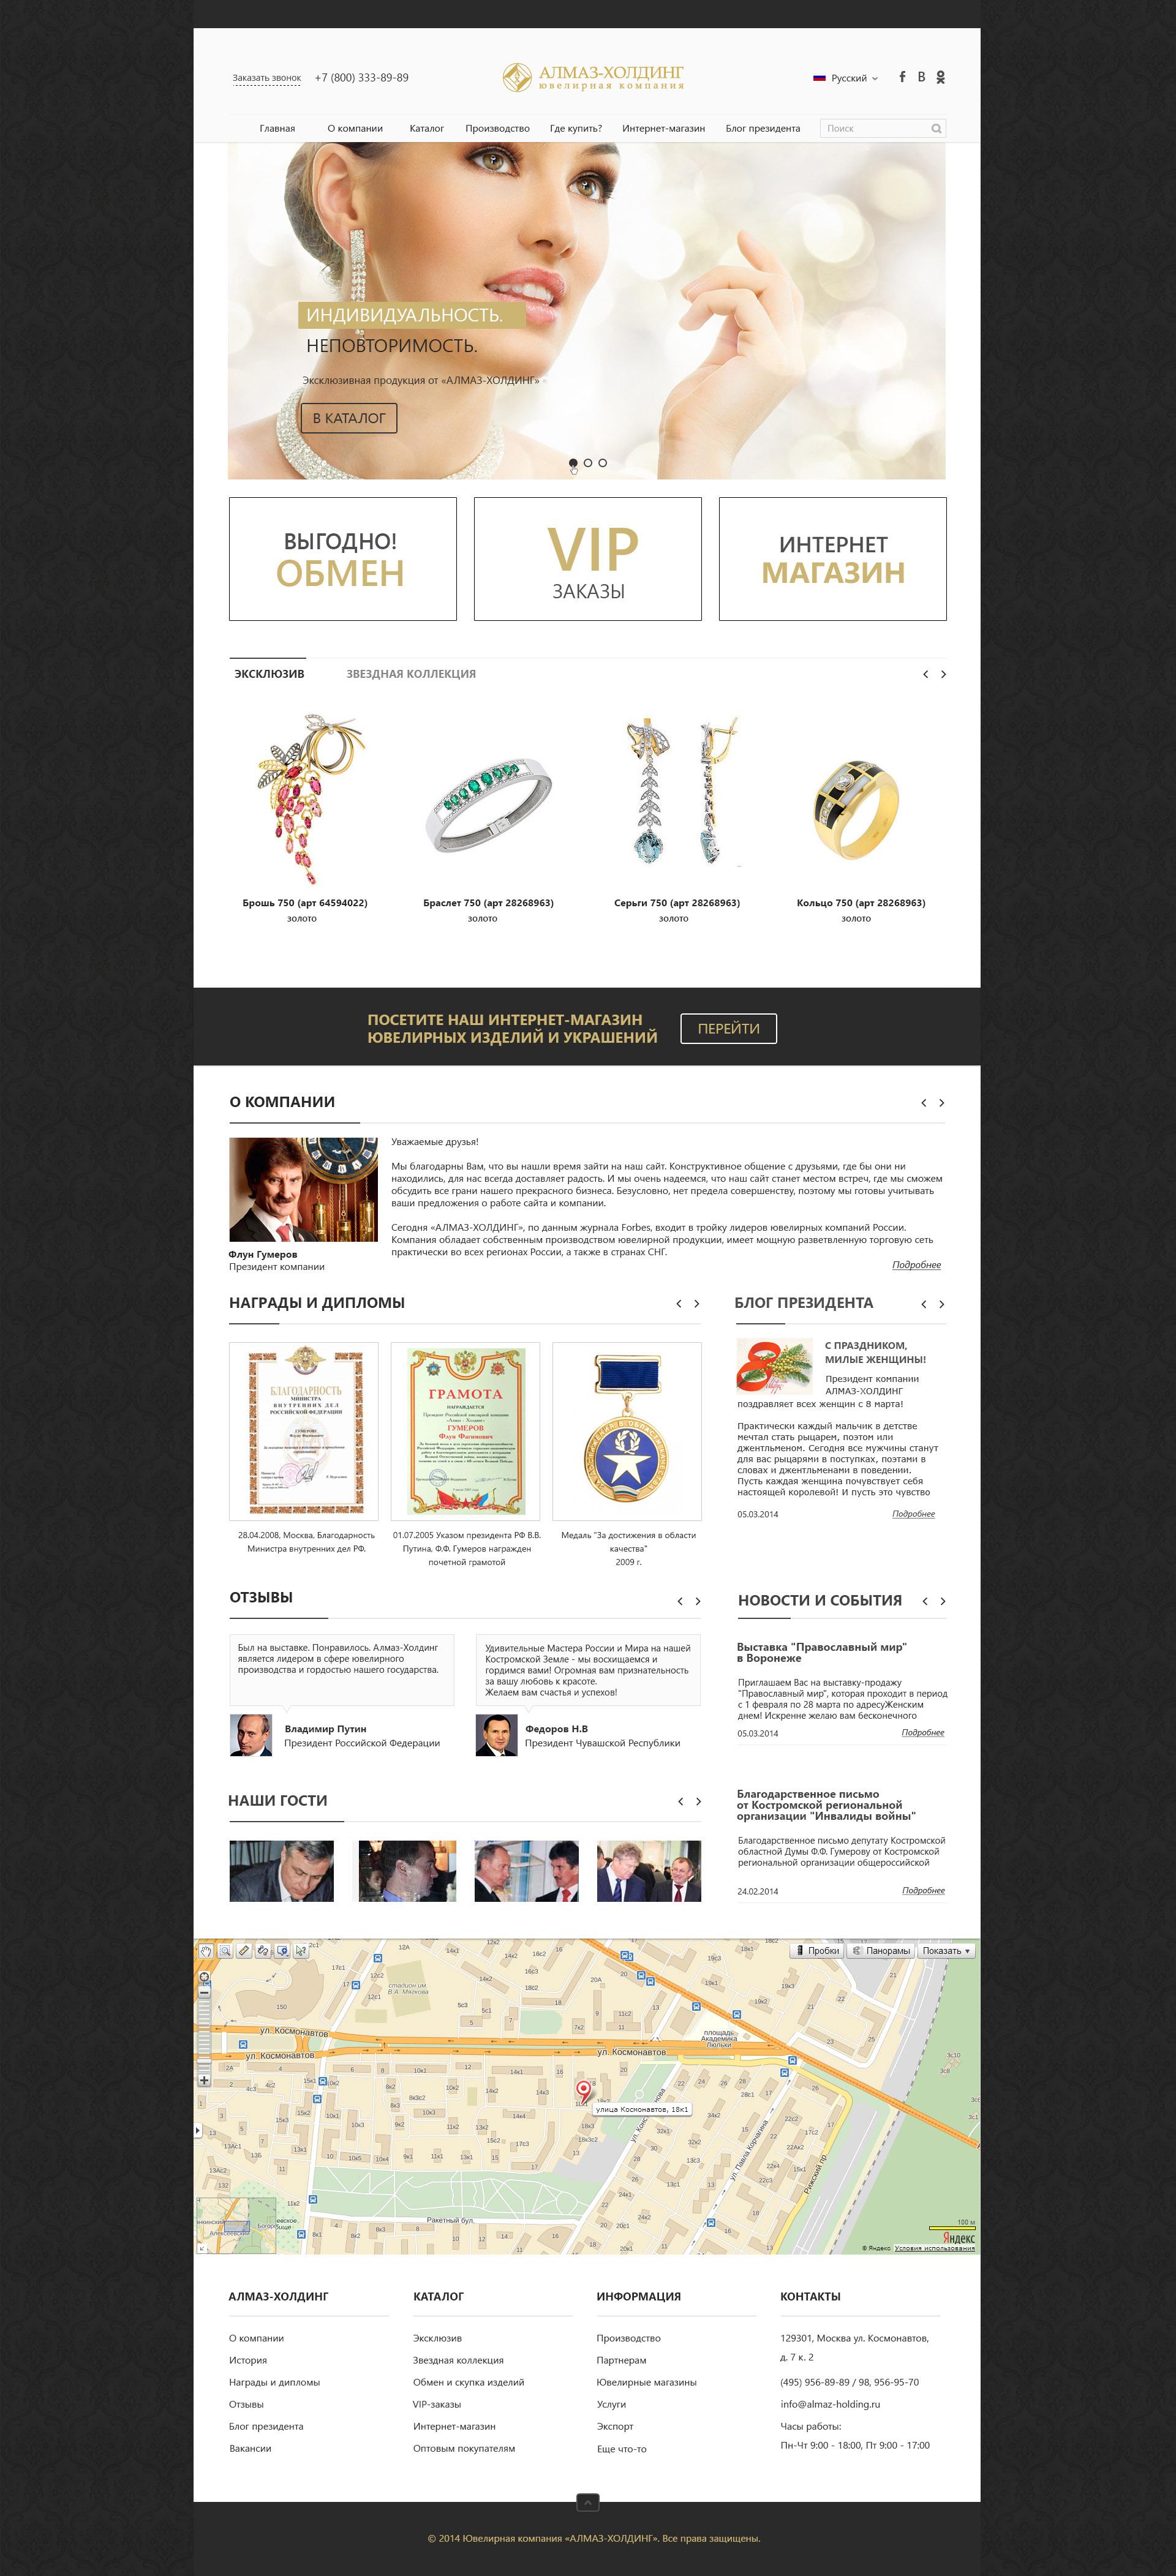 Дизайн сайта для ювелирной компании Алмаз-Холдинг фото f_635531ff0a2a0395.jpg